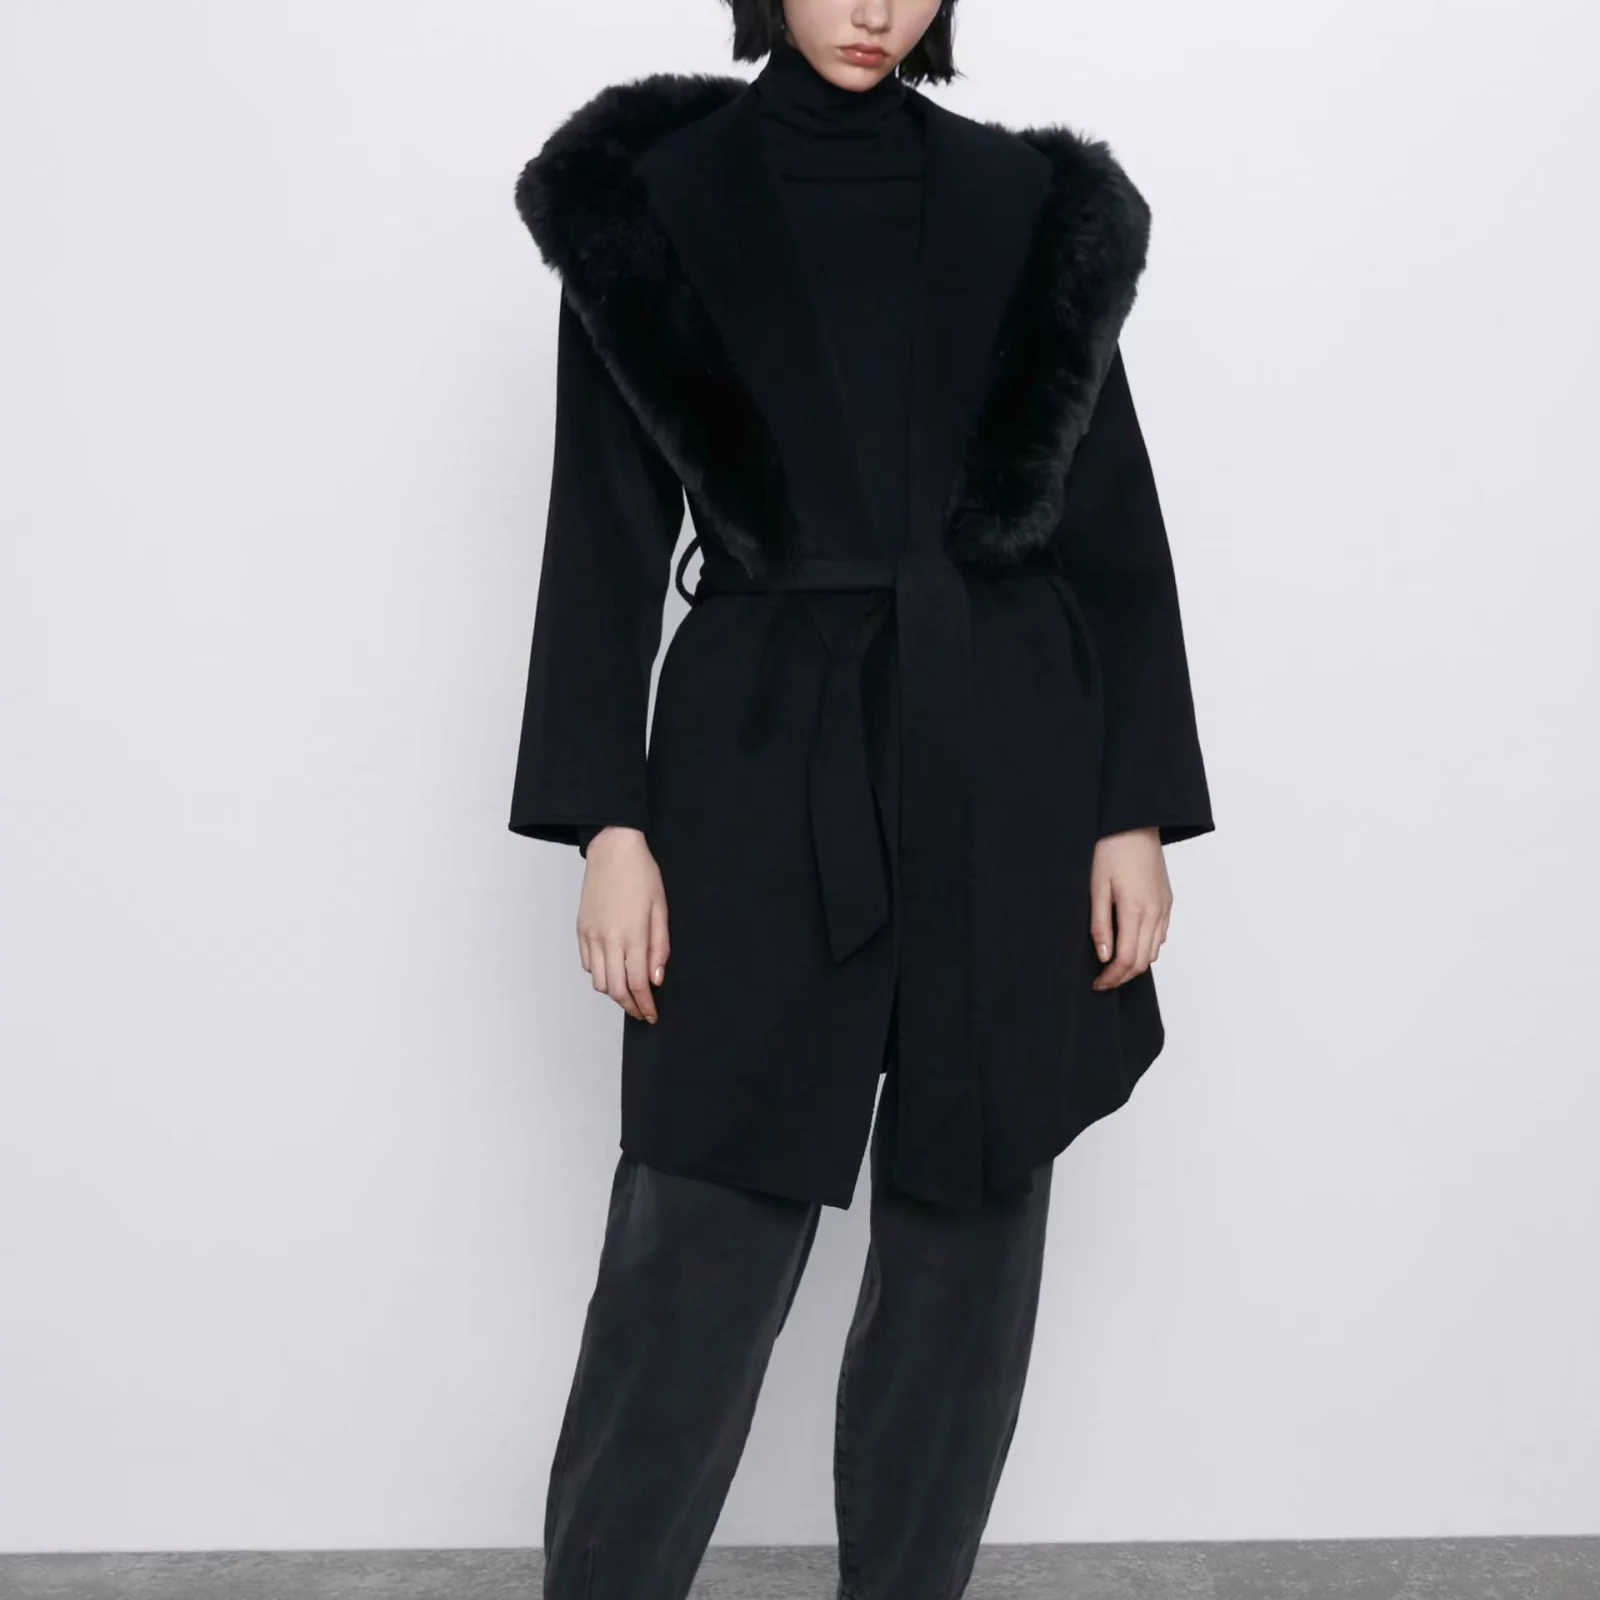 Za outono inverno casaco de lã gola de pele das mulheres faixas quente moda casual senhora outerwear casaco de lã parka feminino roupas femininas